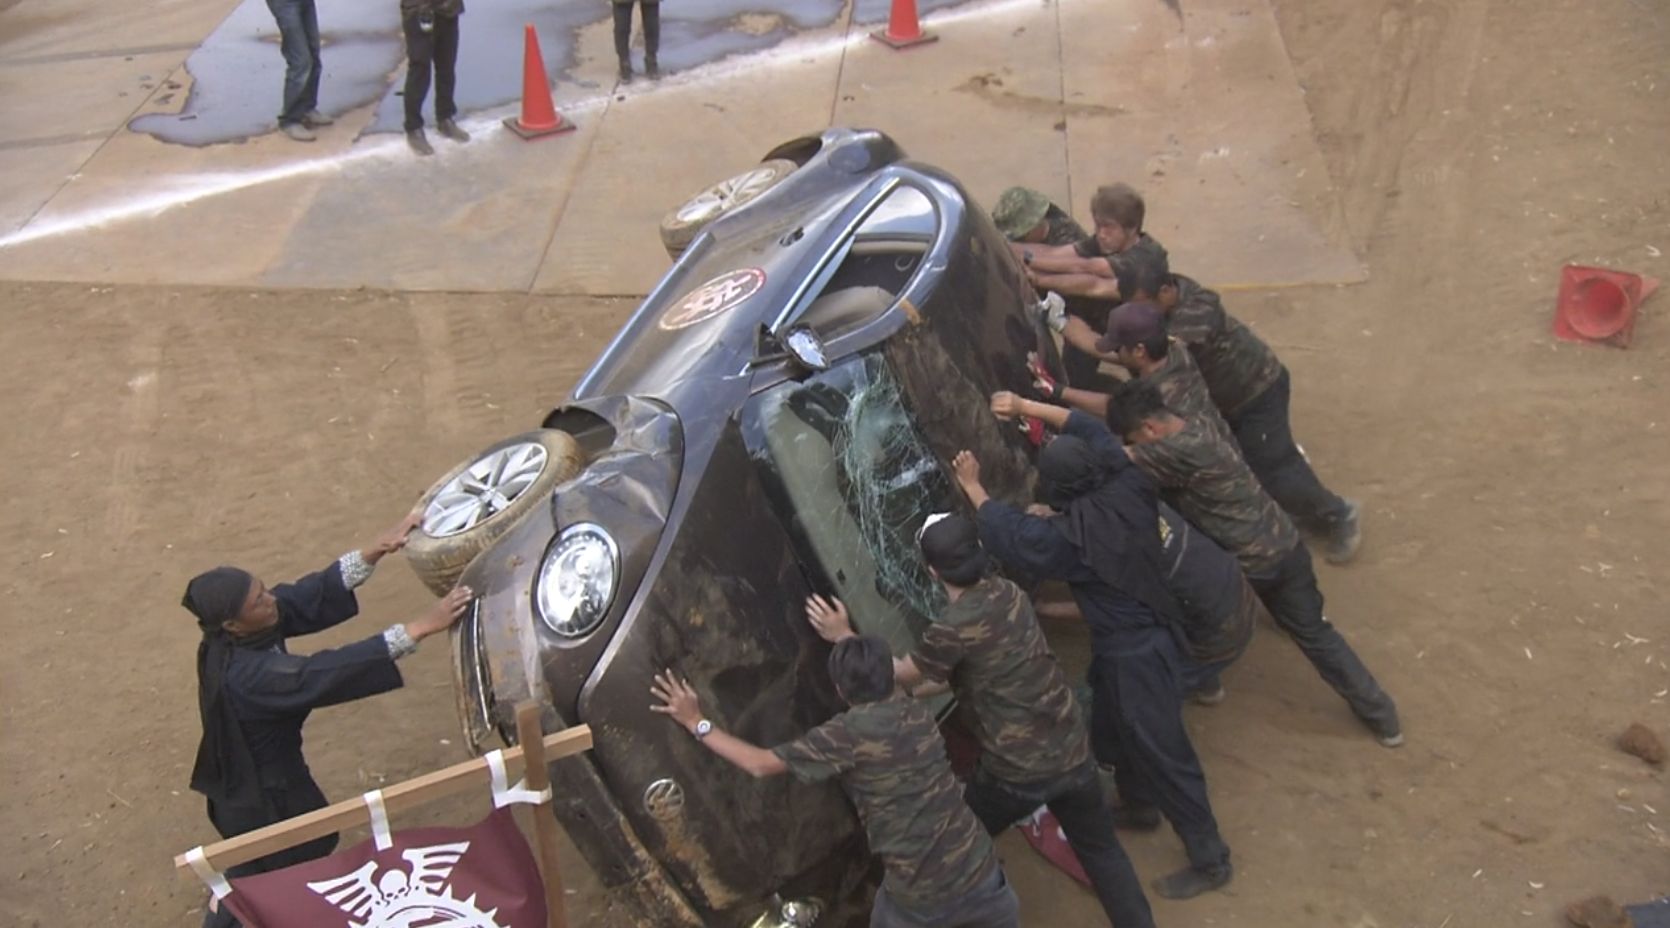 Amazonオリジナルの「戦闘車」を見たら車勿体無さ過ぎたwwww